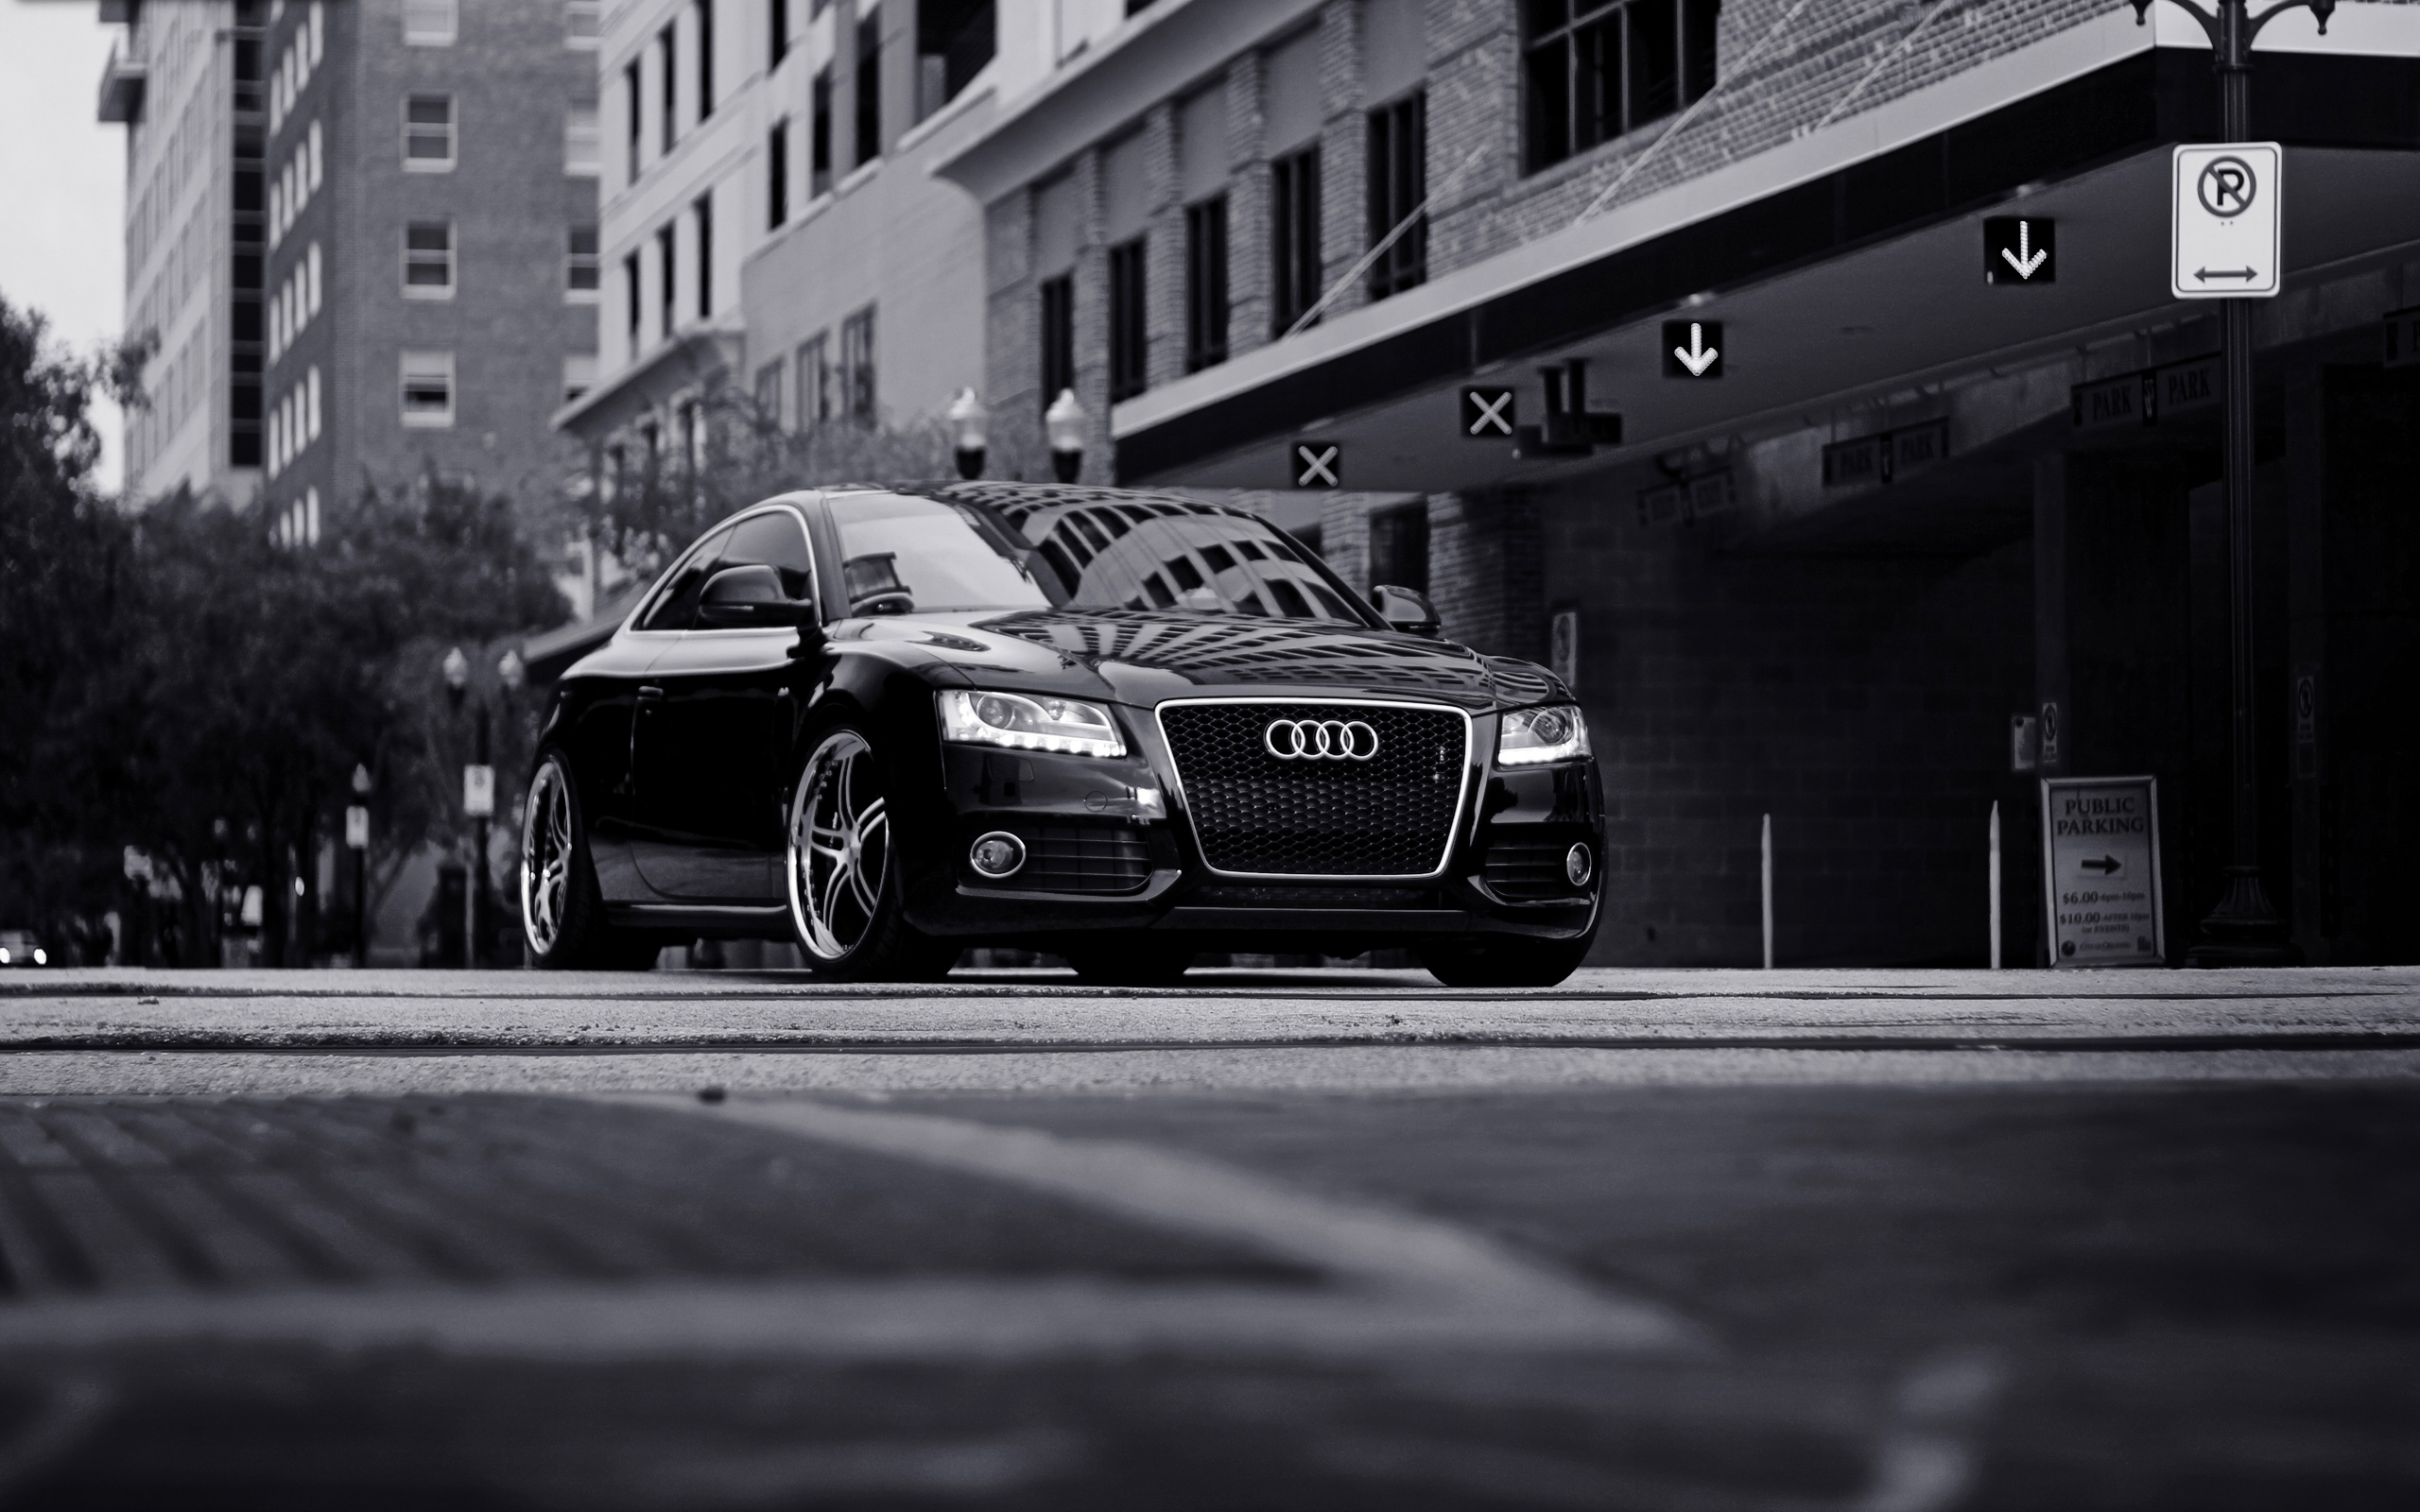 Camaro Car Hd Wallpapers For Mobile Black Audi Backgrounds Pixelstalk Net